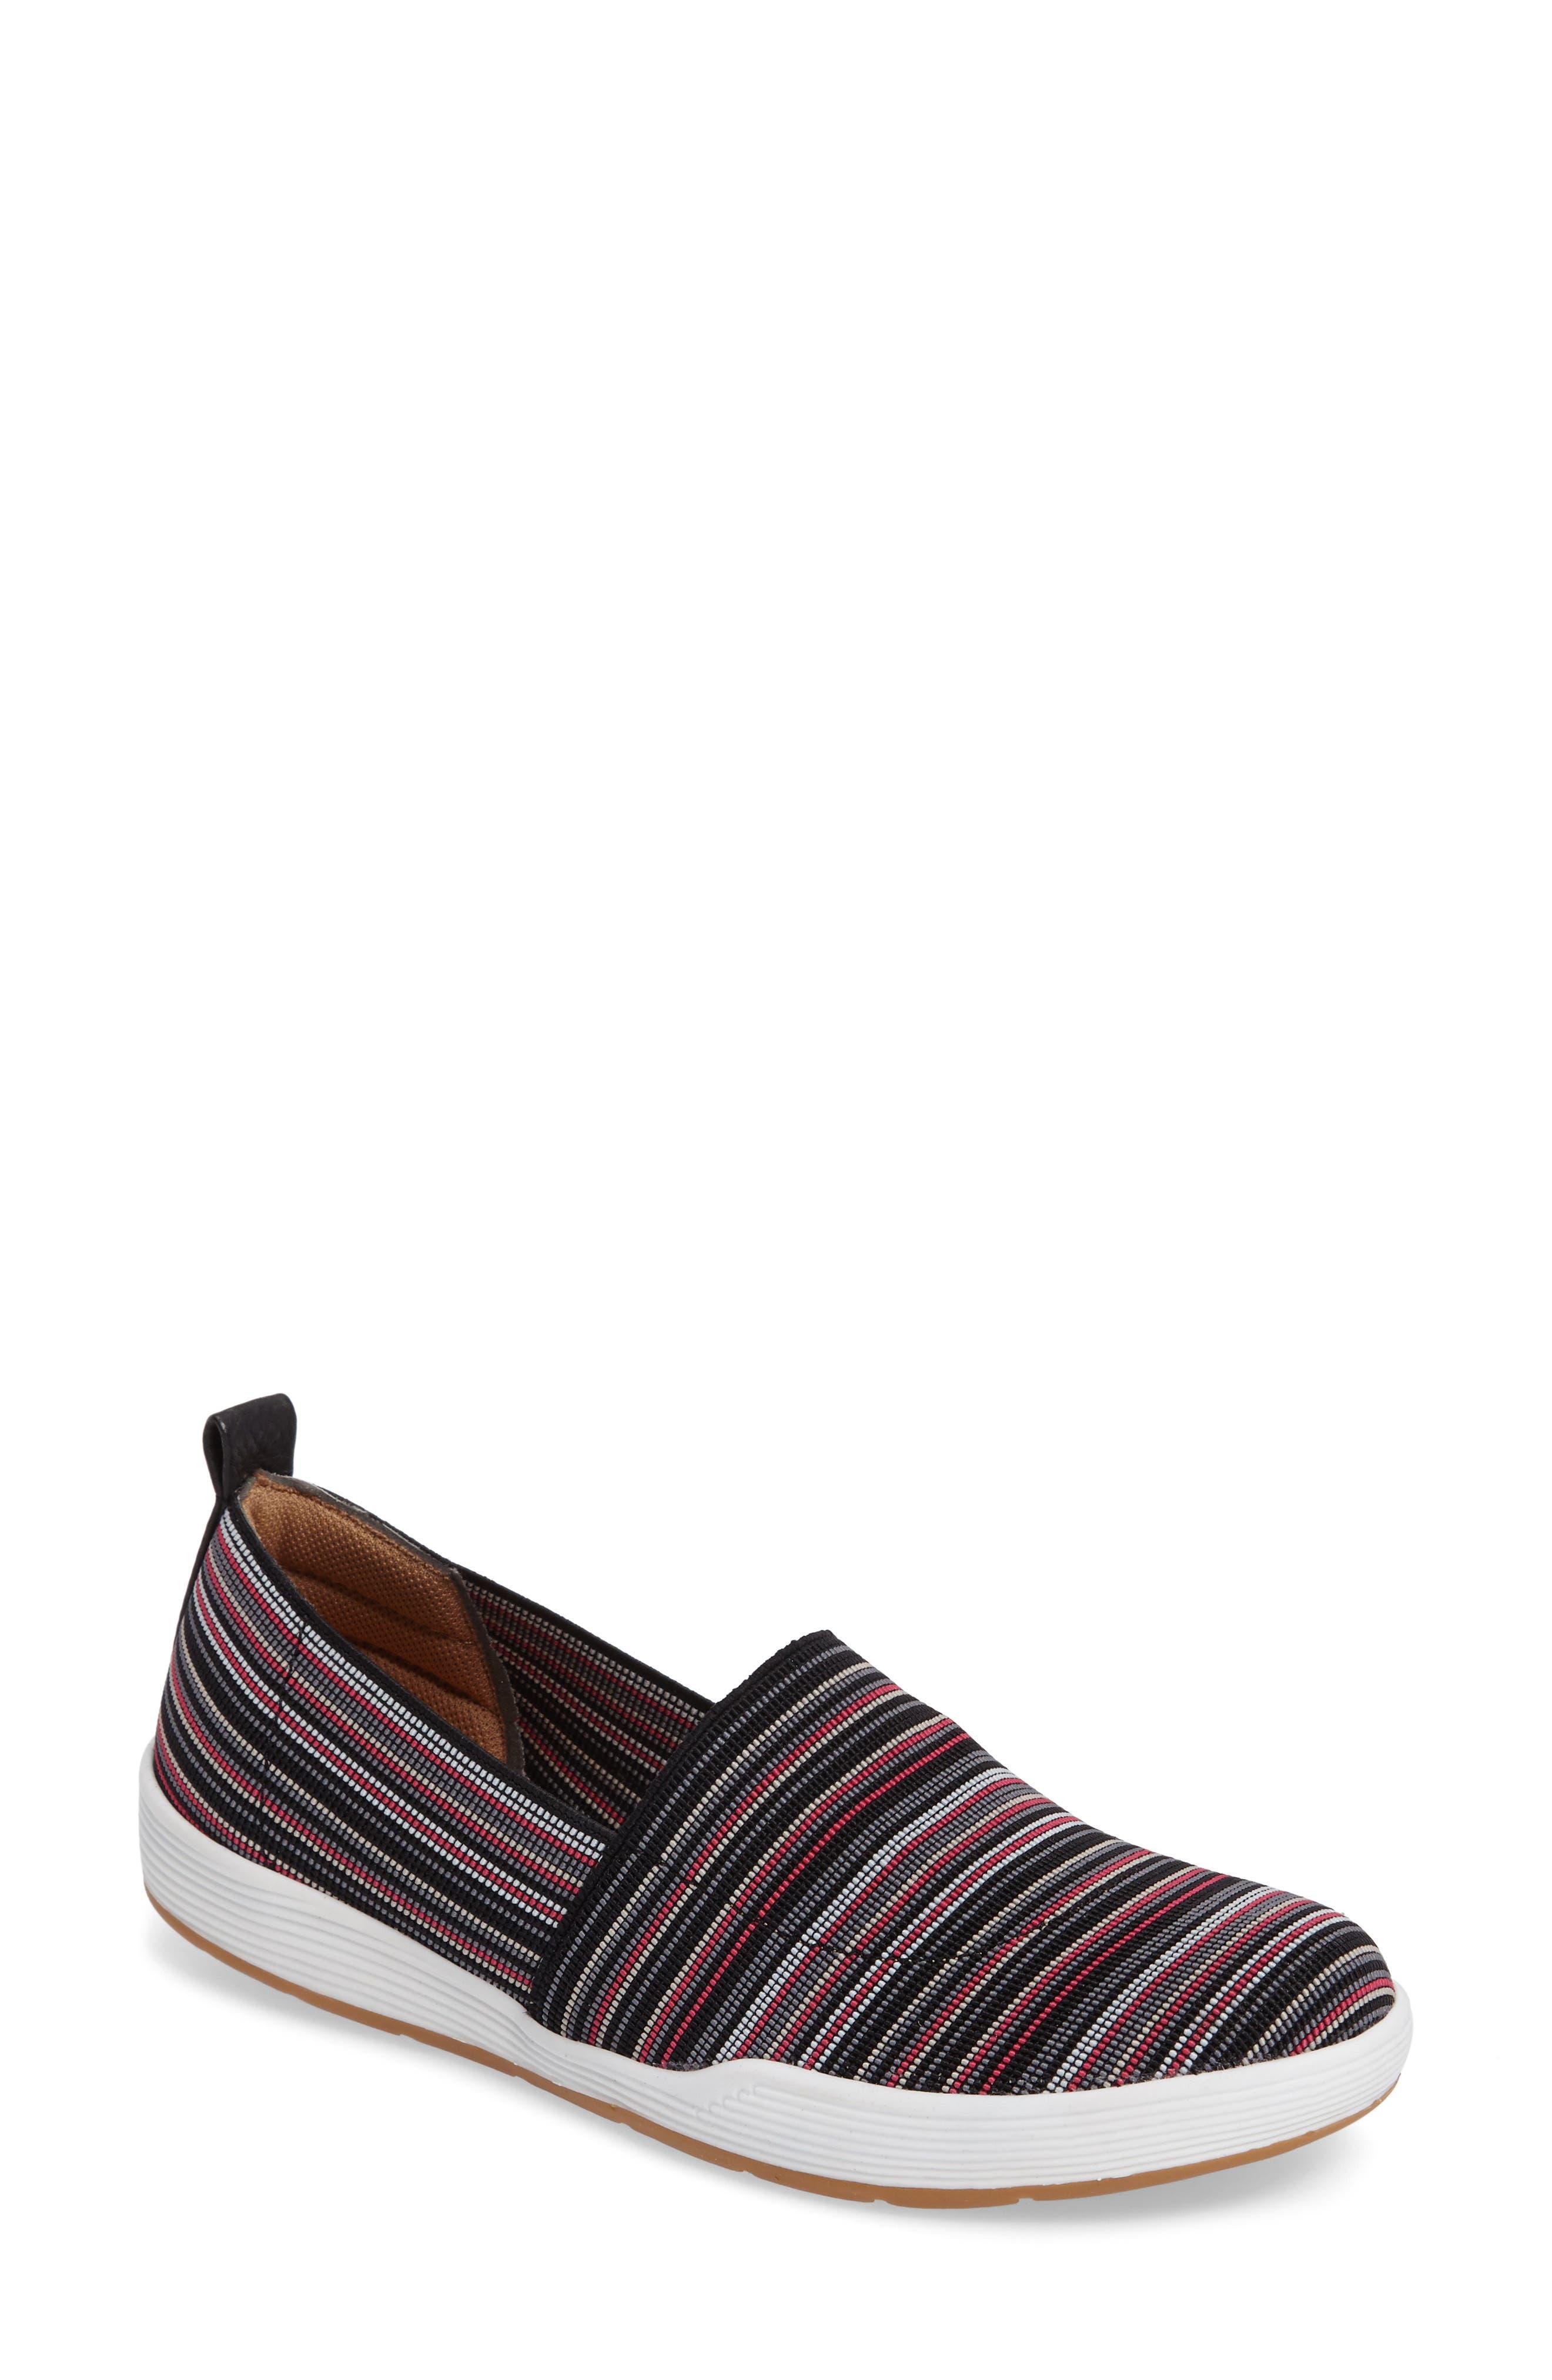 Lida Slip-On Flat,                         Main,                         color,